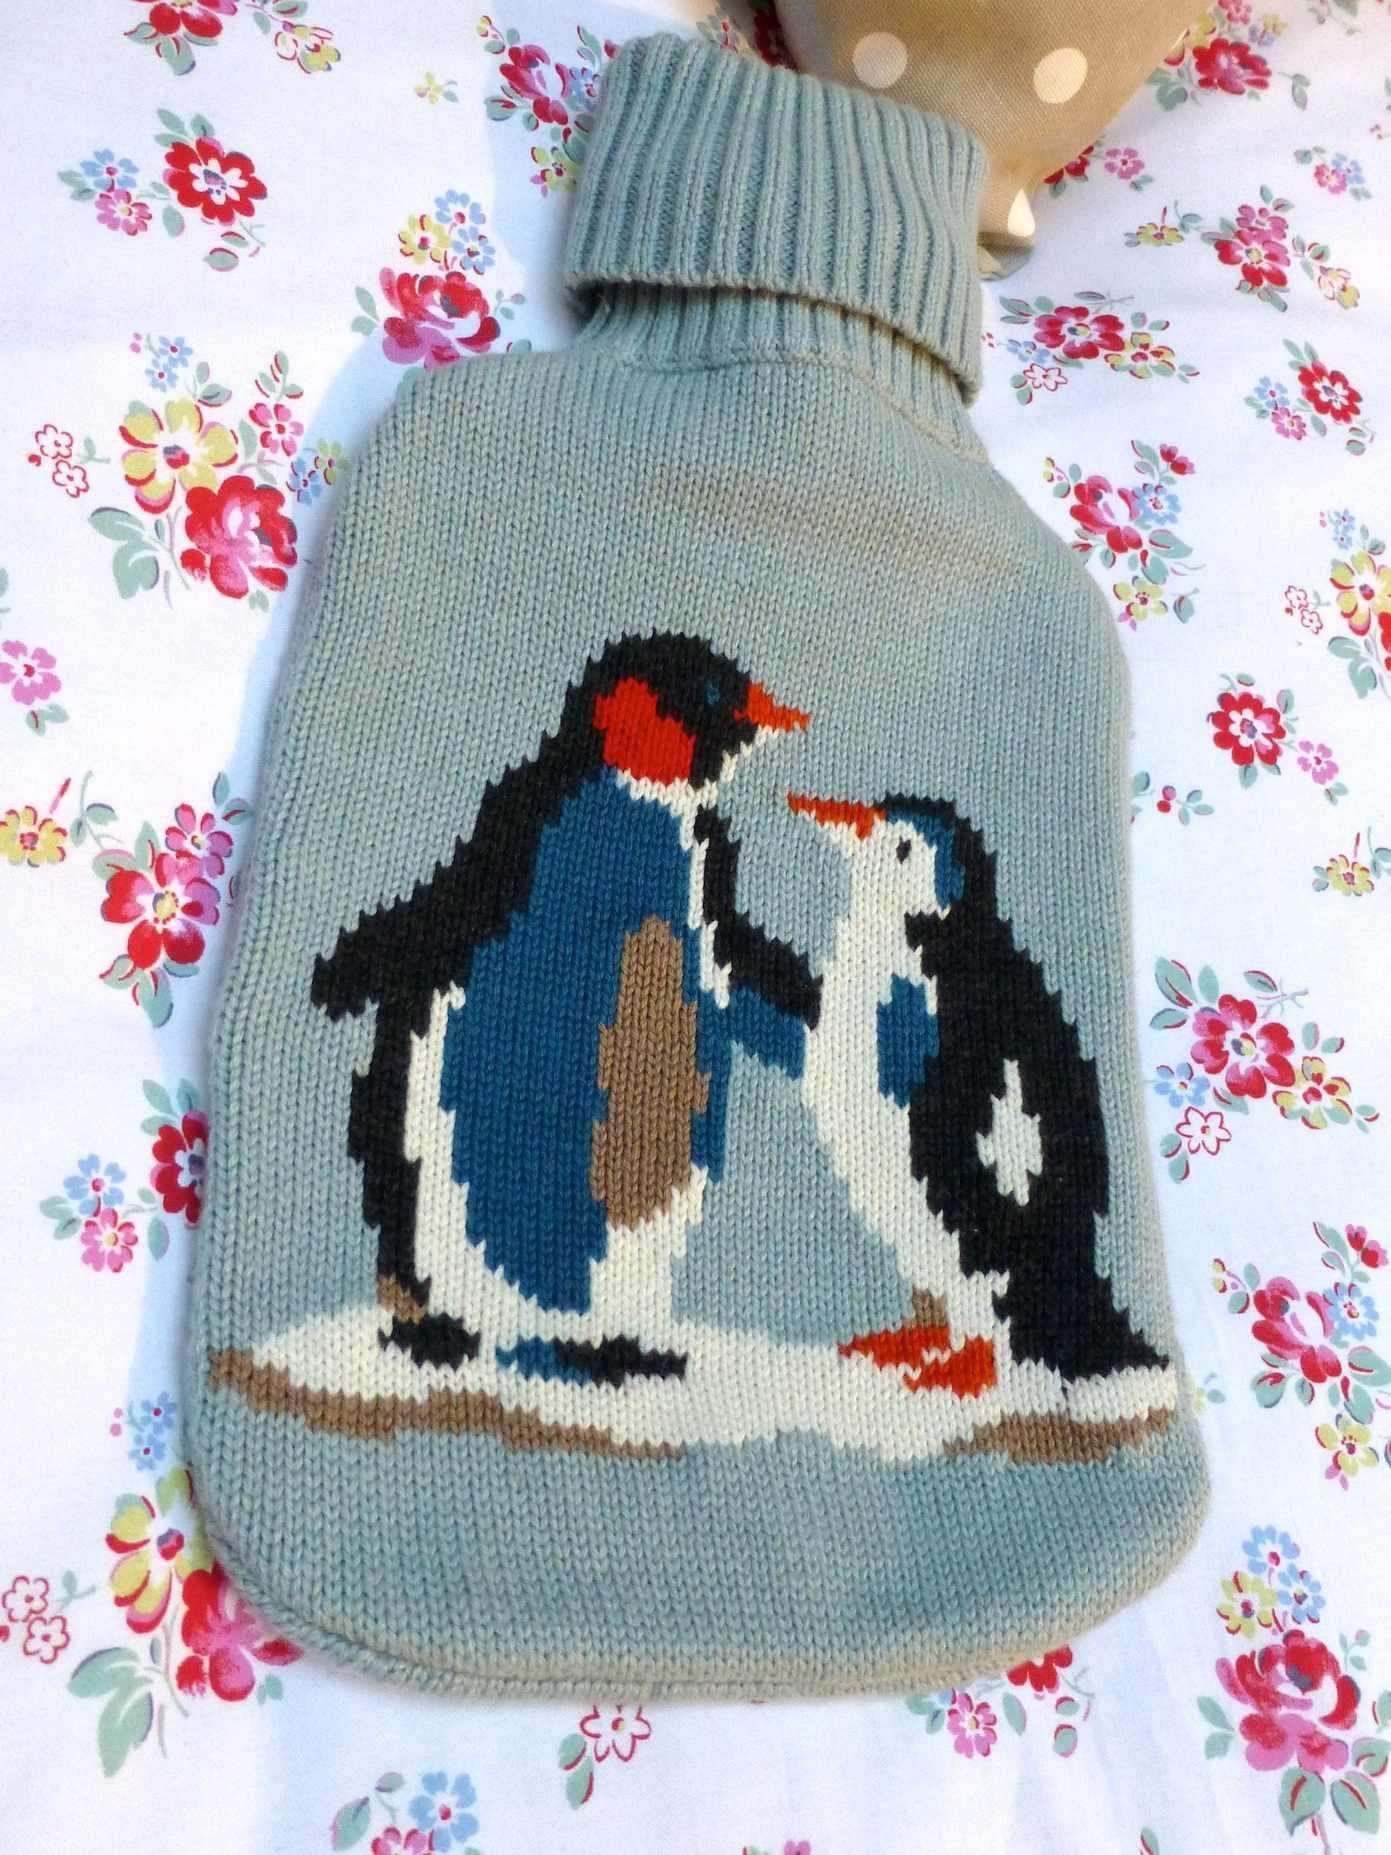 felt penguin pattern - Google Search | Knitted water bottles ...